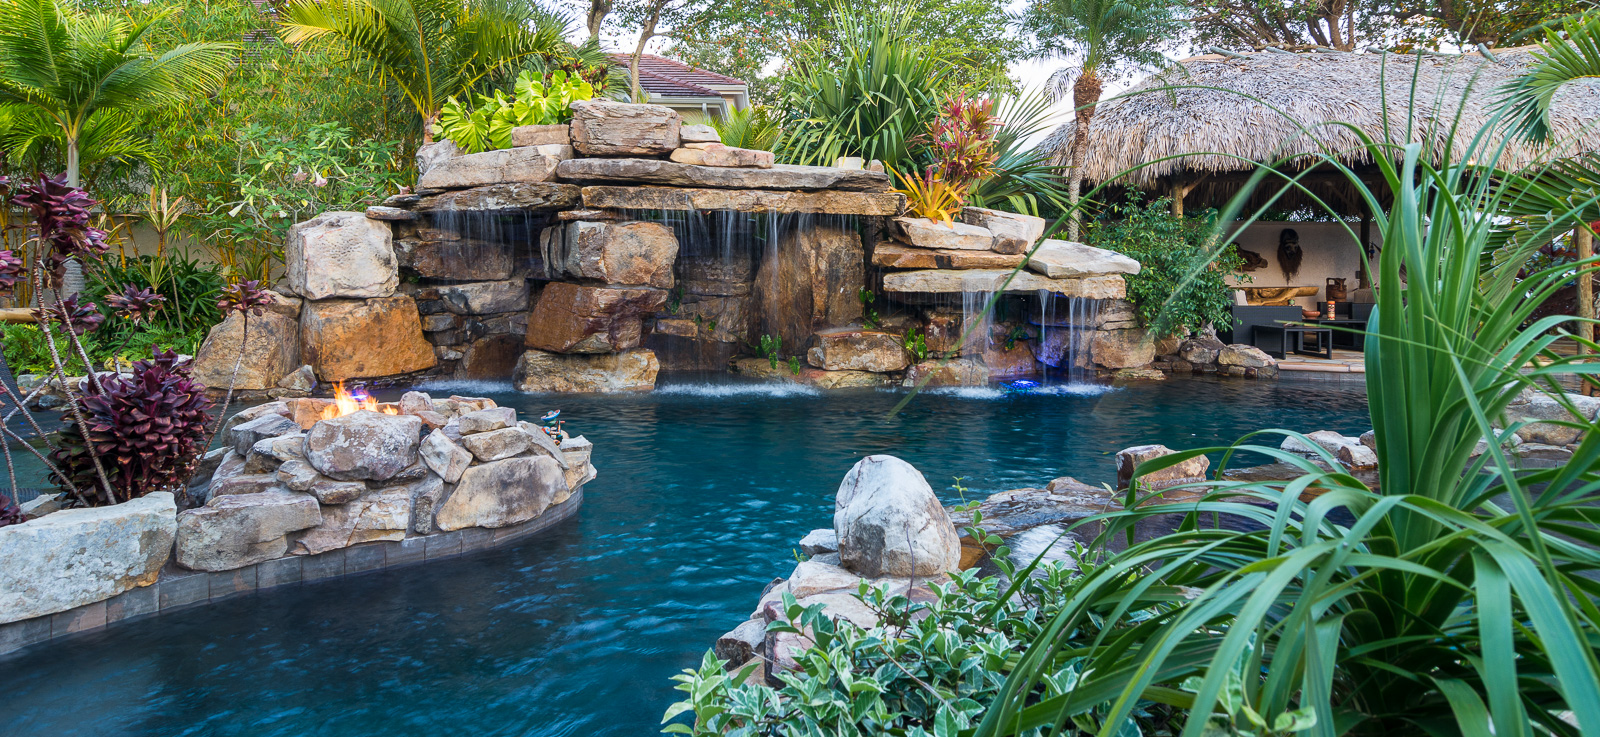 Custom Rock Waterfall Pool Grotto Spa Natural Stream